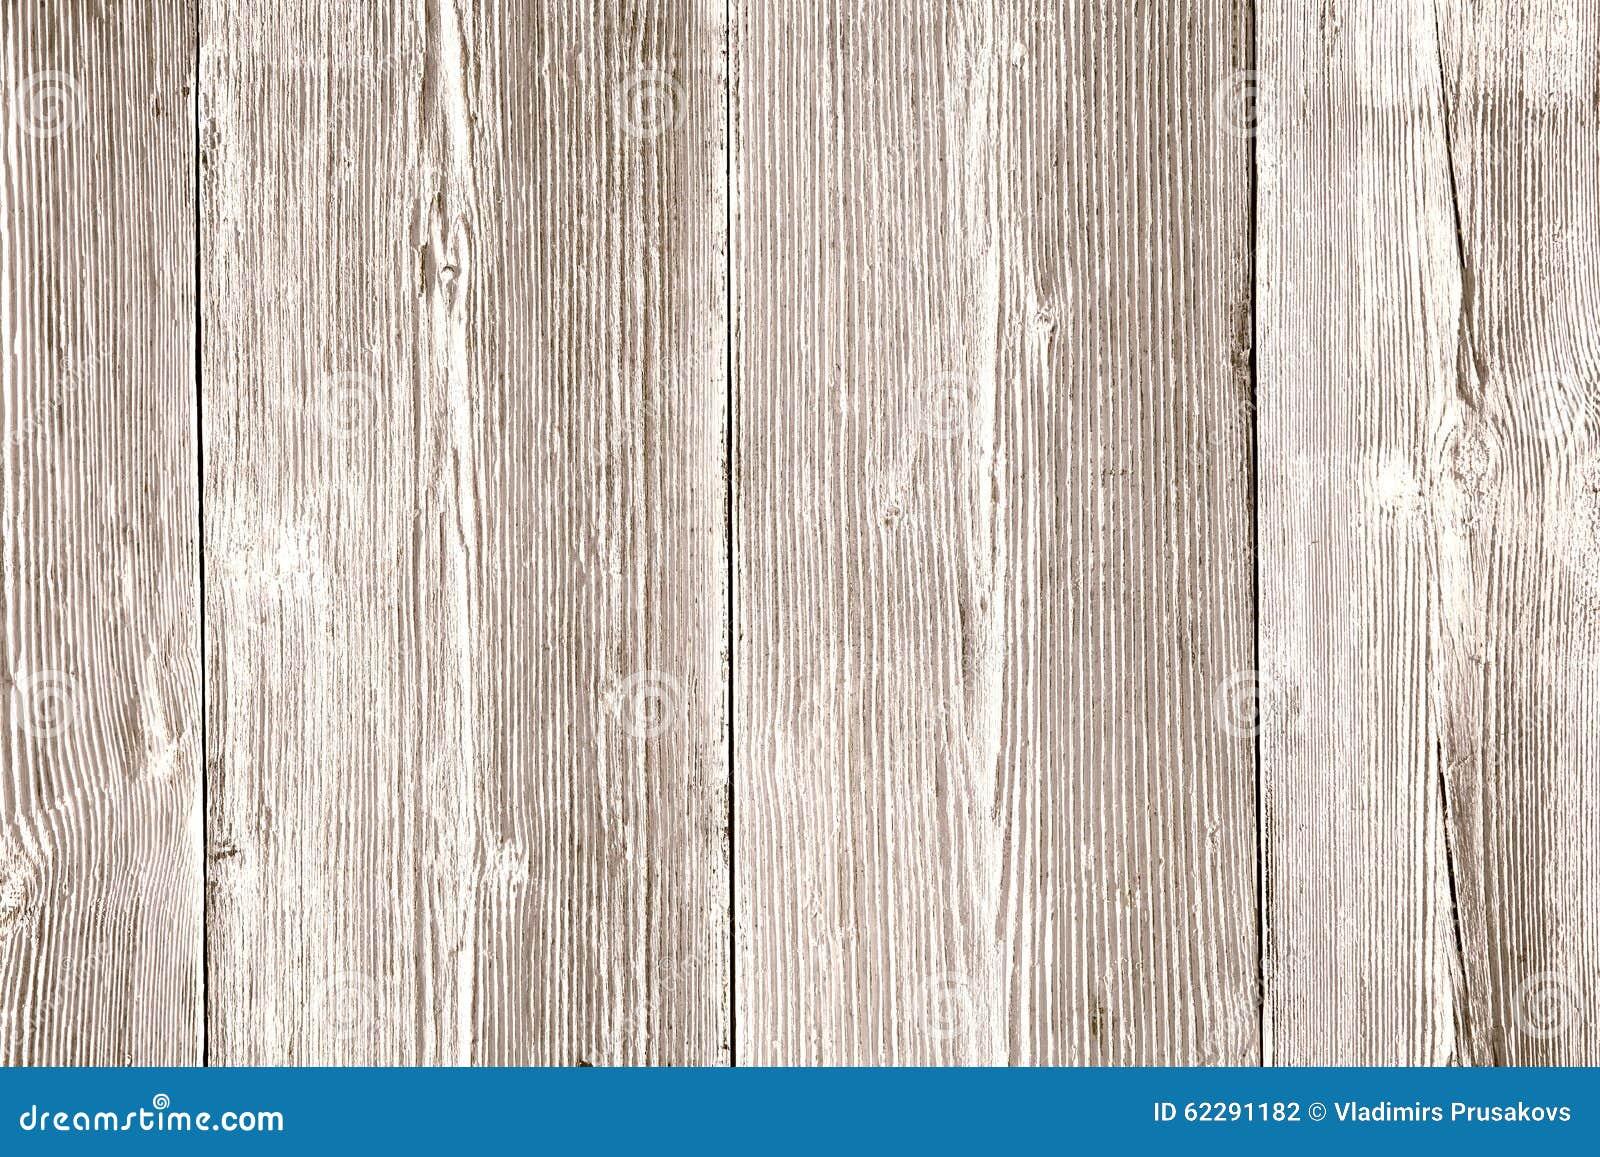 Wood Texture Light Wooden Textured Background Grain